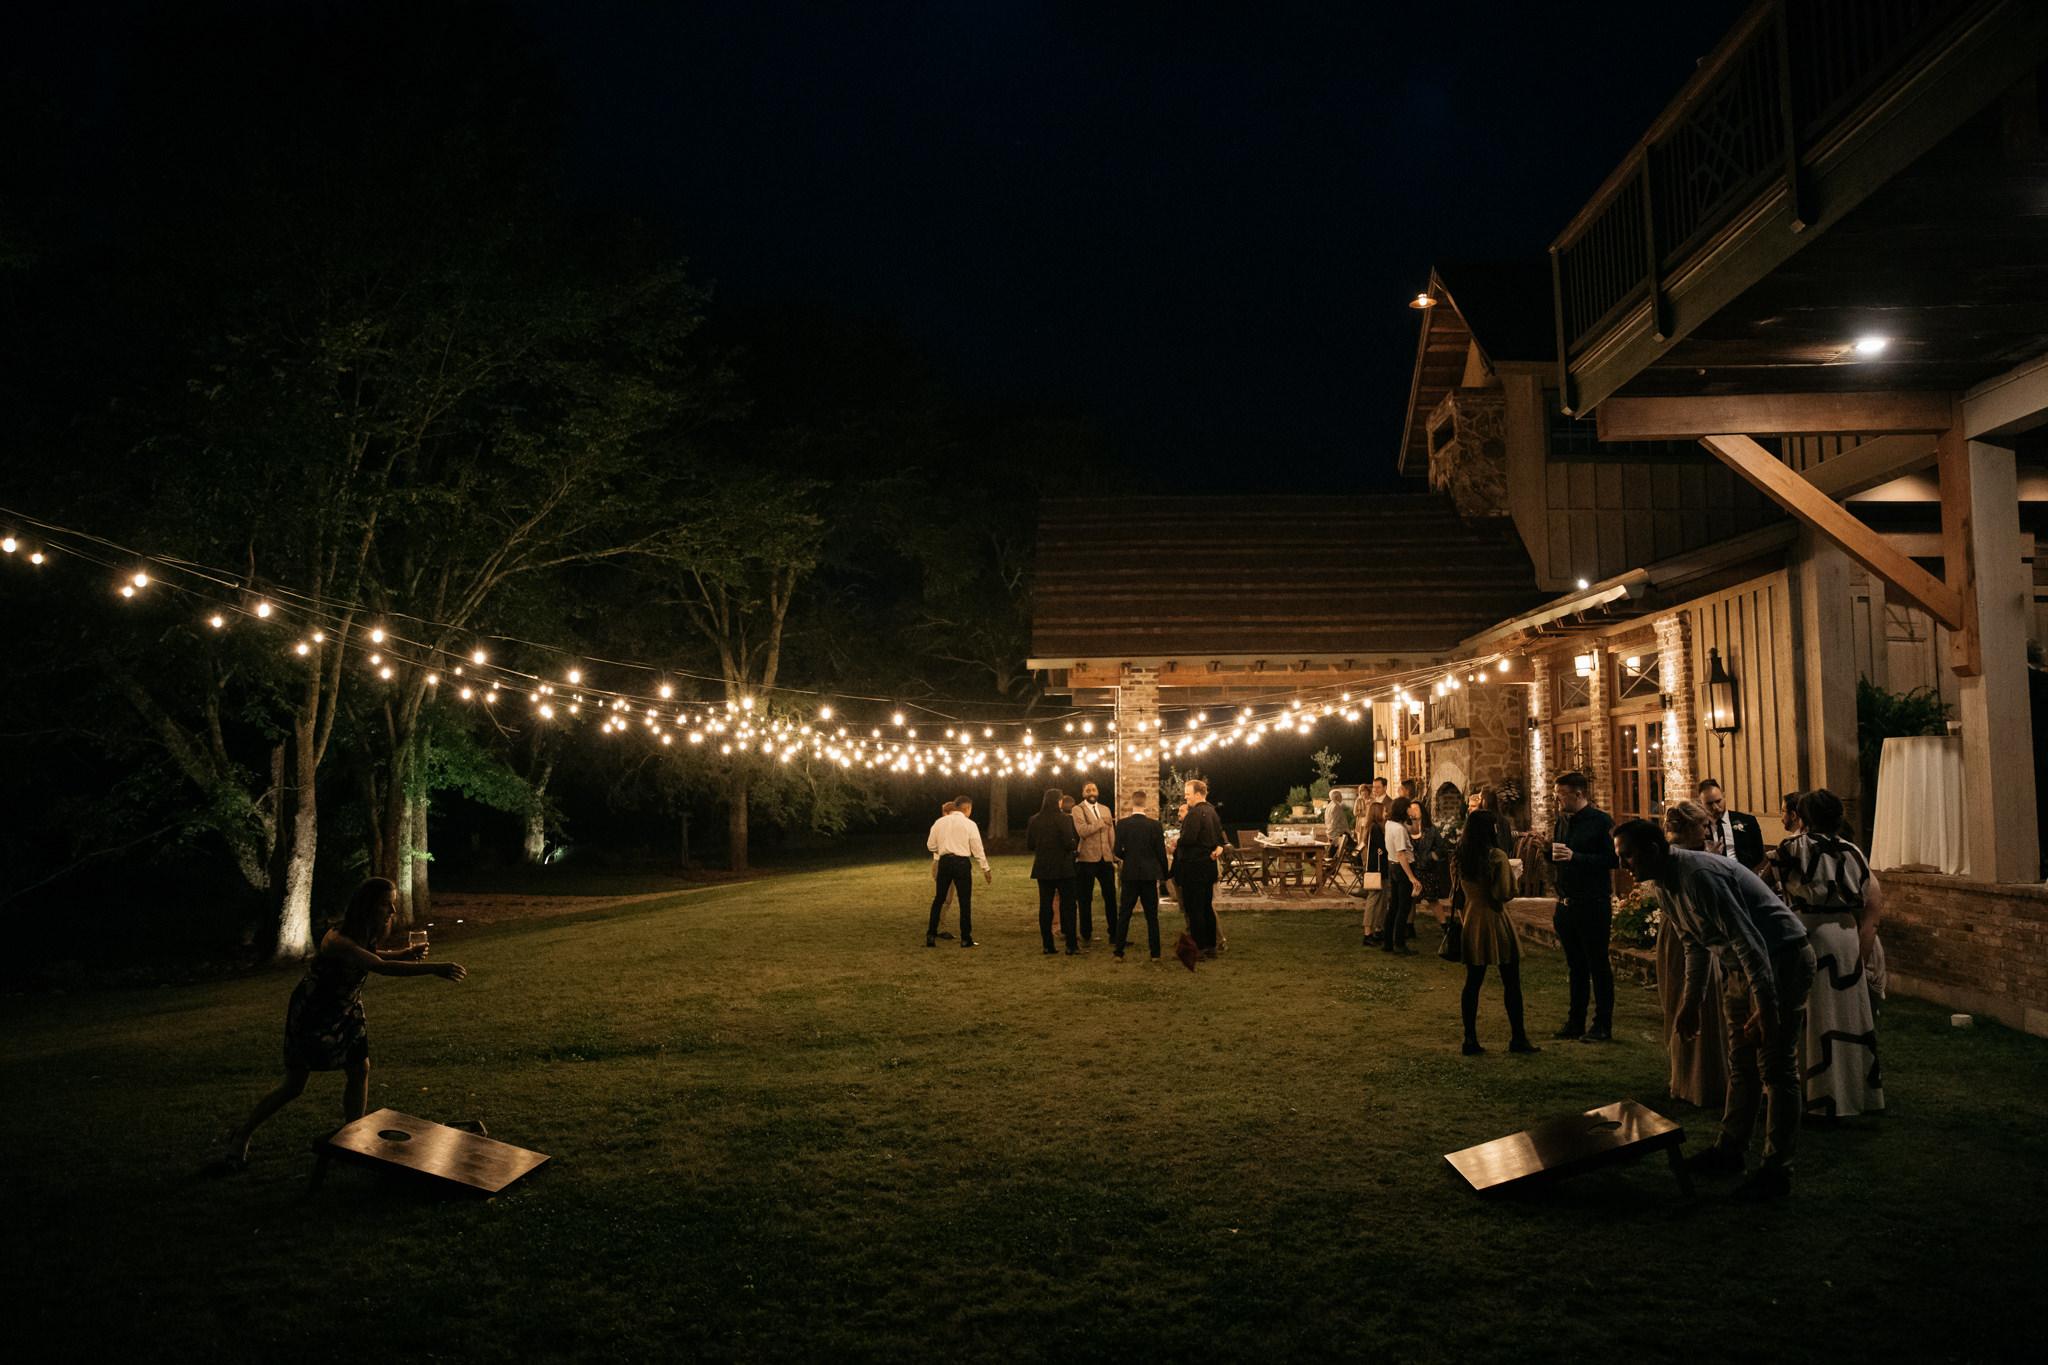 phantom-canyon-brewery-colorado-springs-wedding-photographer-460.jpg